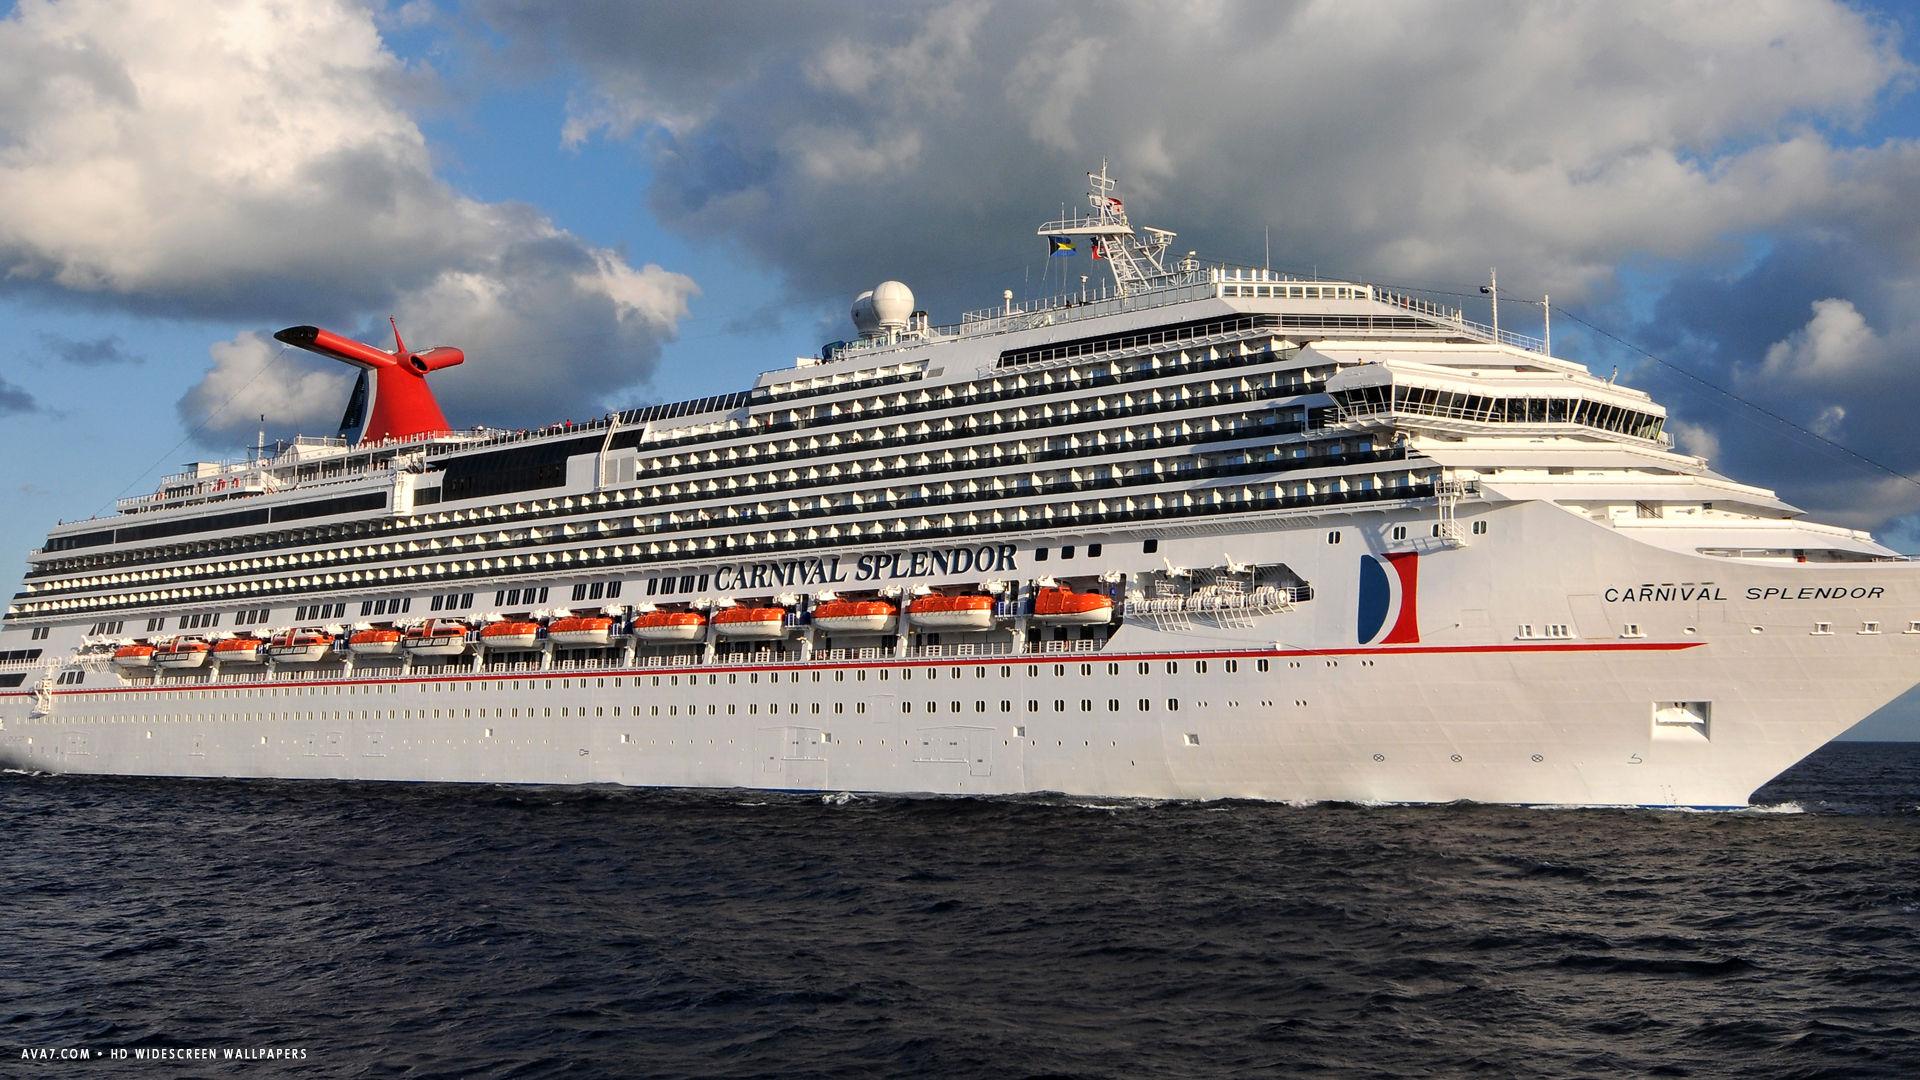 carnival splendor cruise ship hd widescreen wallpaper cruise ships 1920x1080